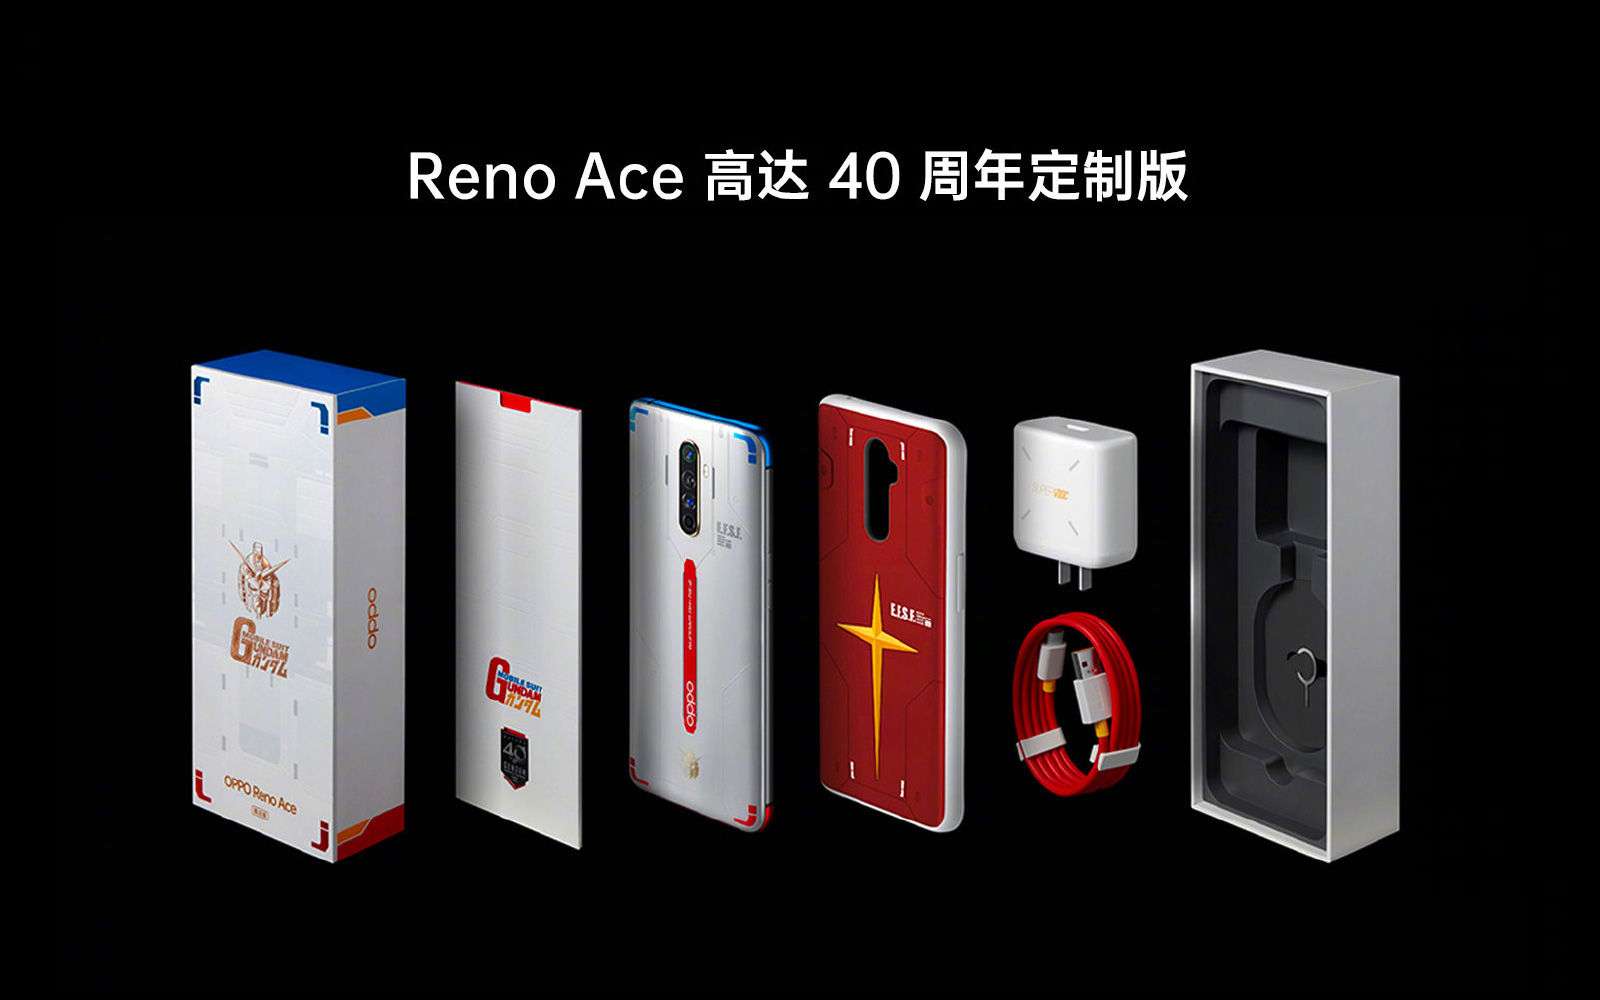 OPPO Reno Ace Gundam